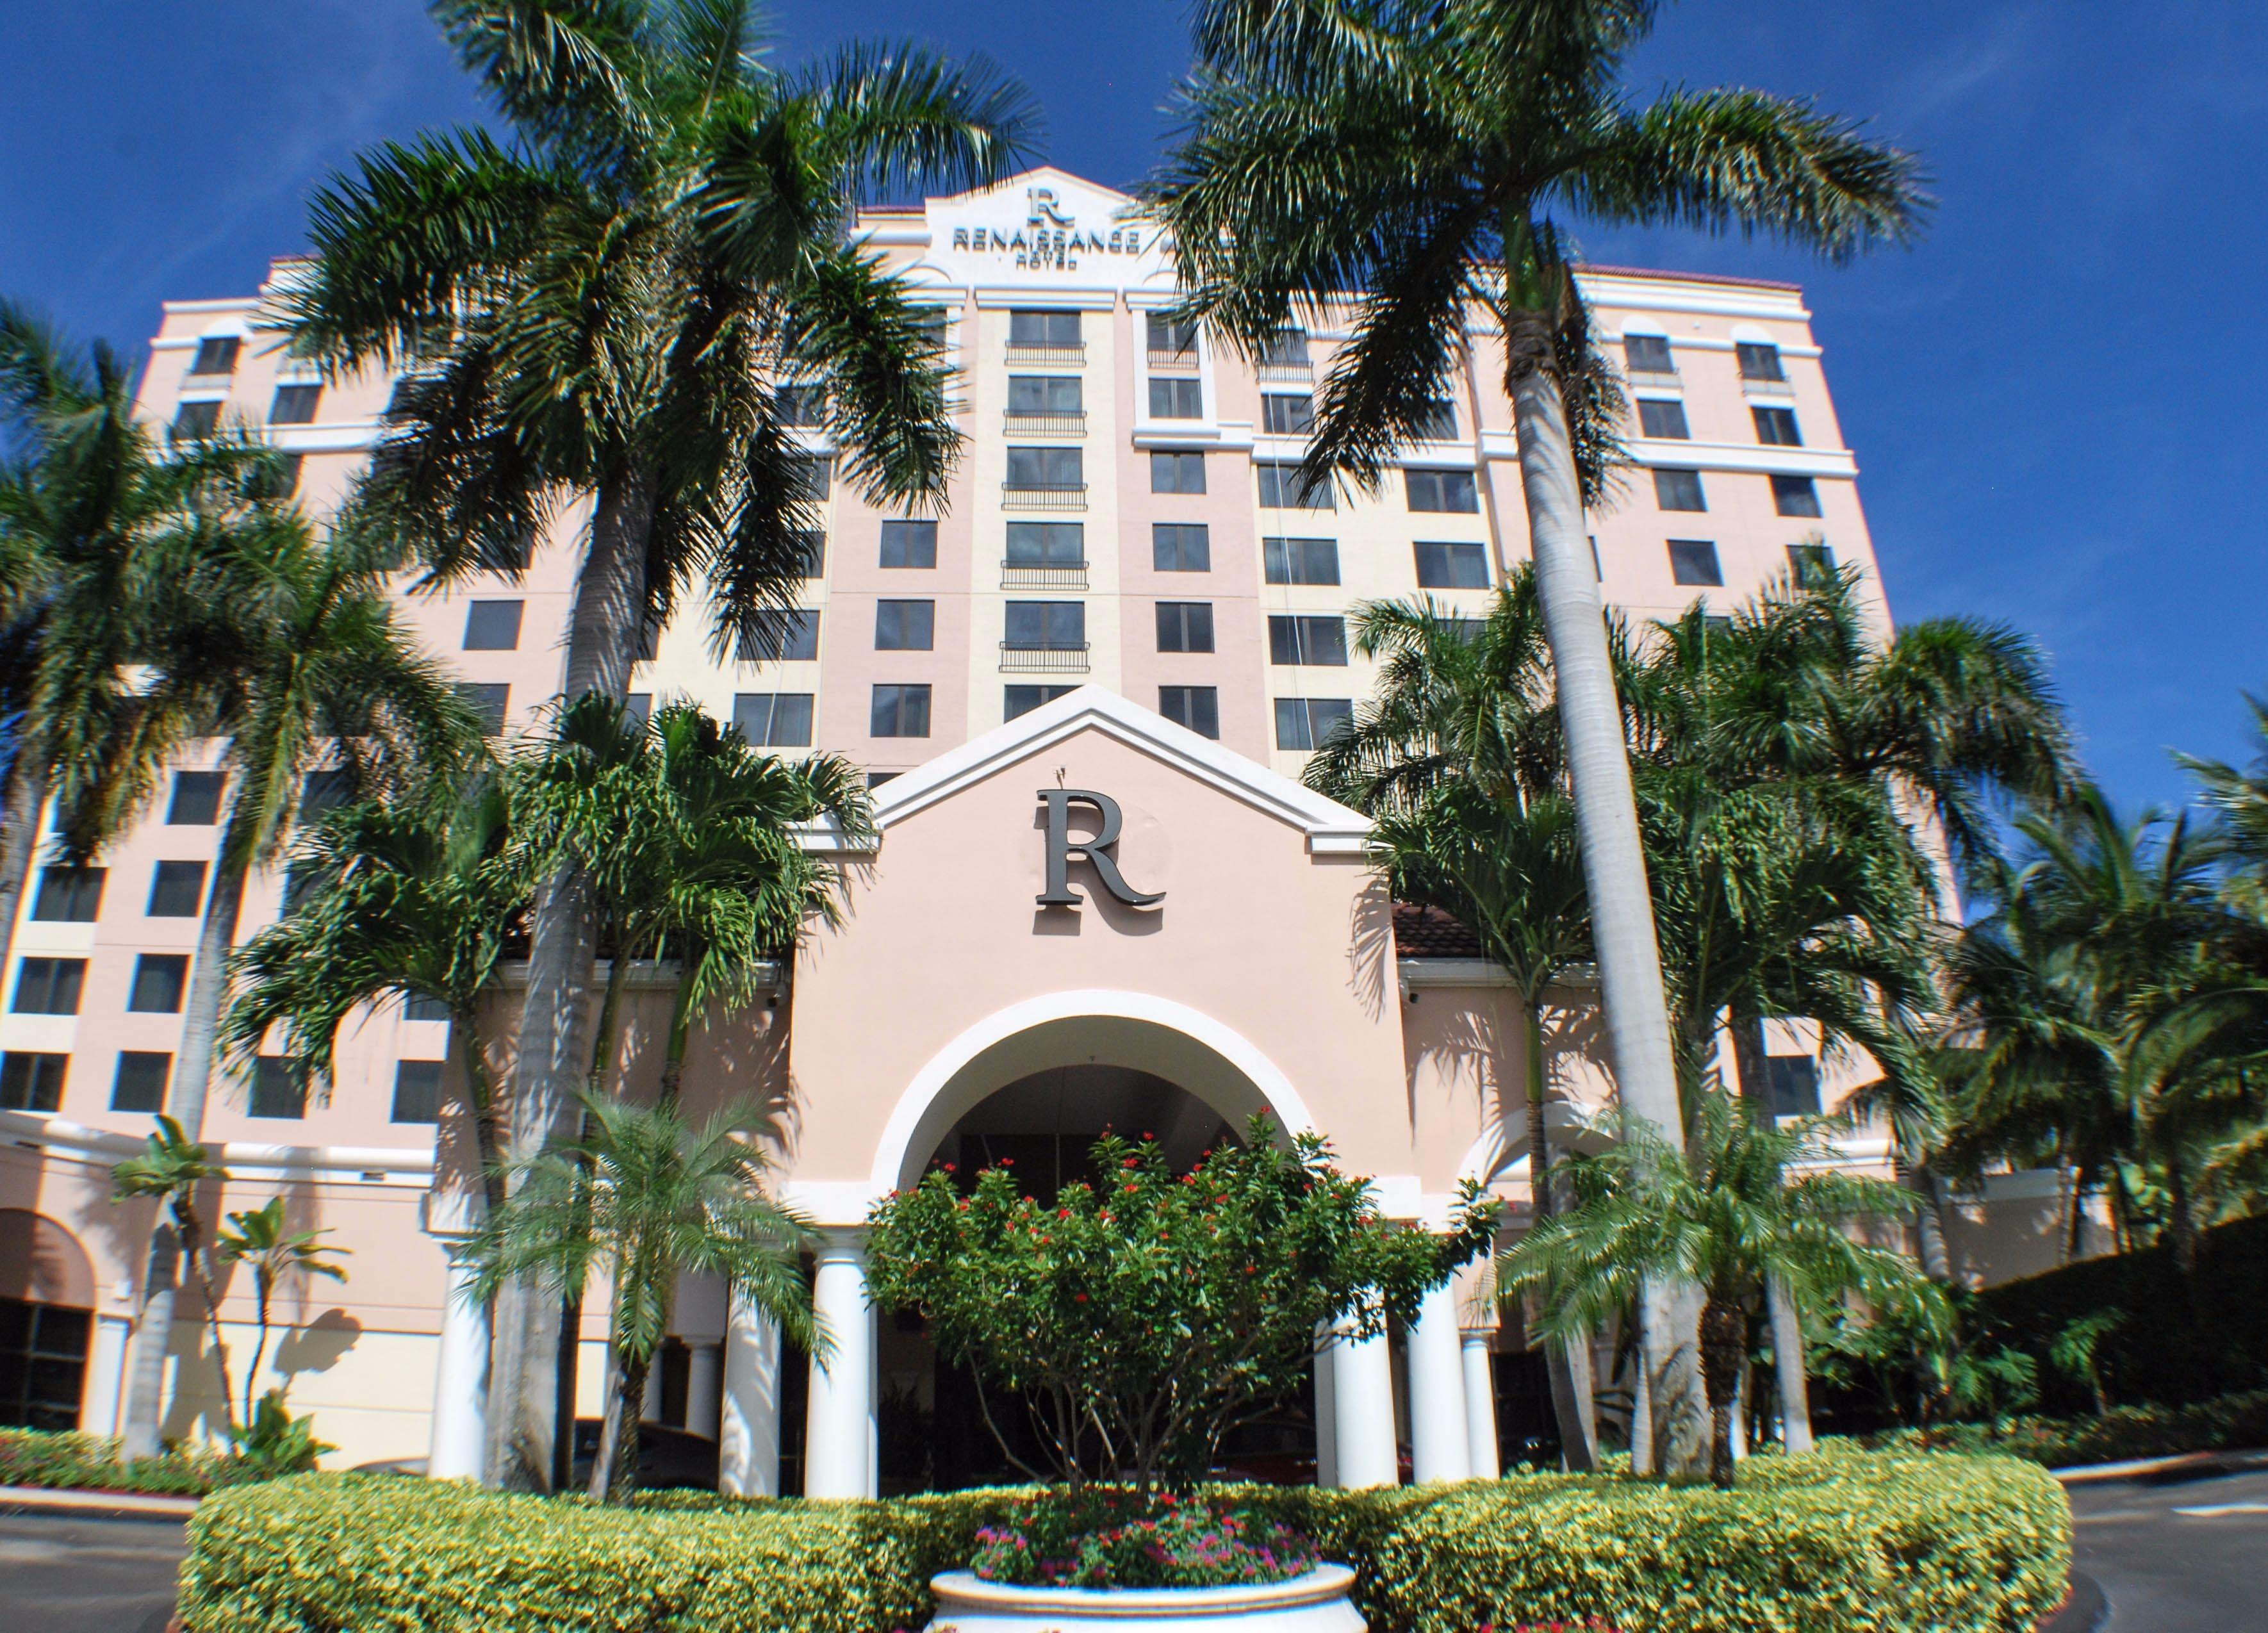 Renaissance Fort Lauderdale Cruise Port Hotel image 0